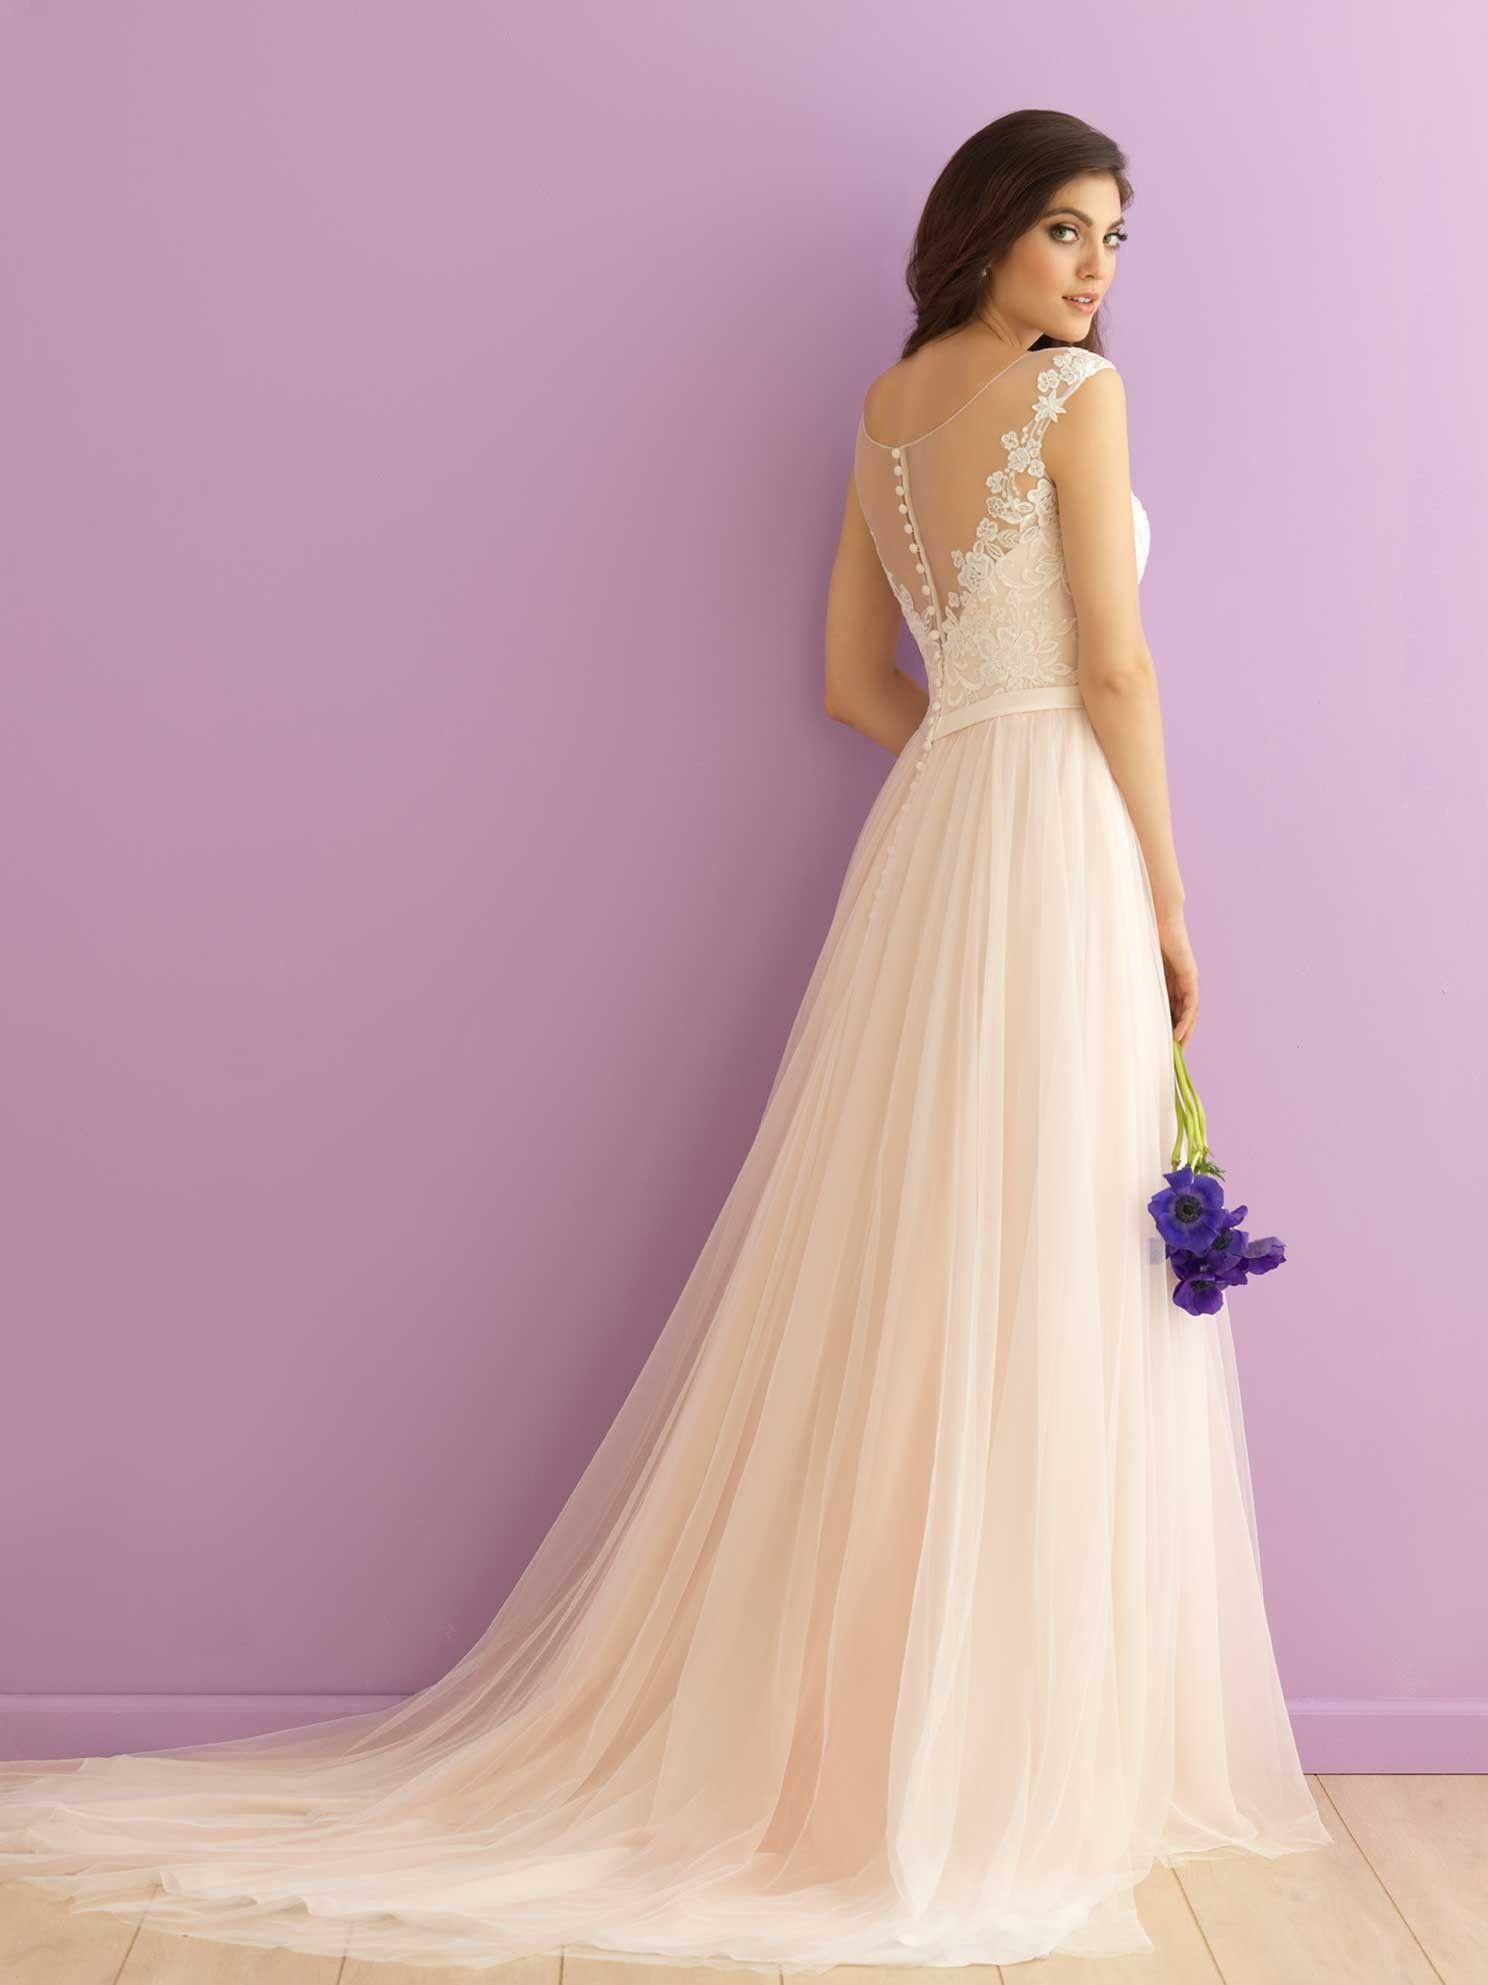 Wedding Dresses, Bridesmaid Dresses, Prom Dresses and Bridal Dresses ...